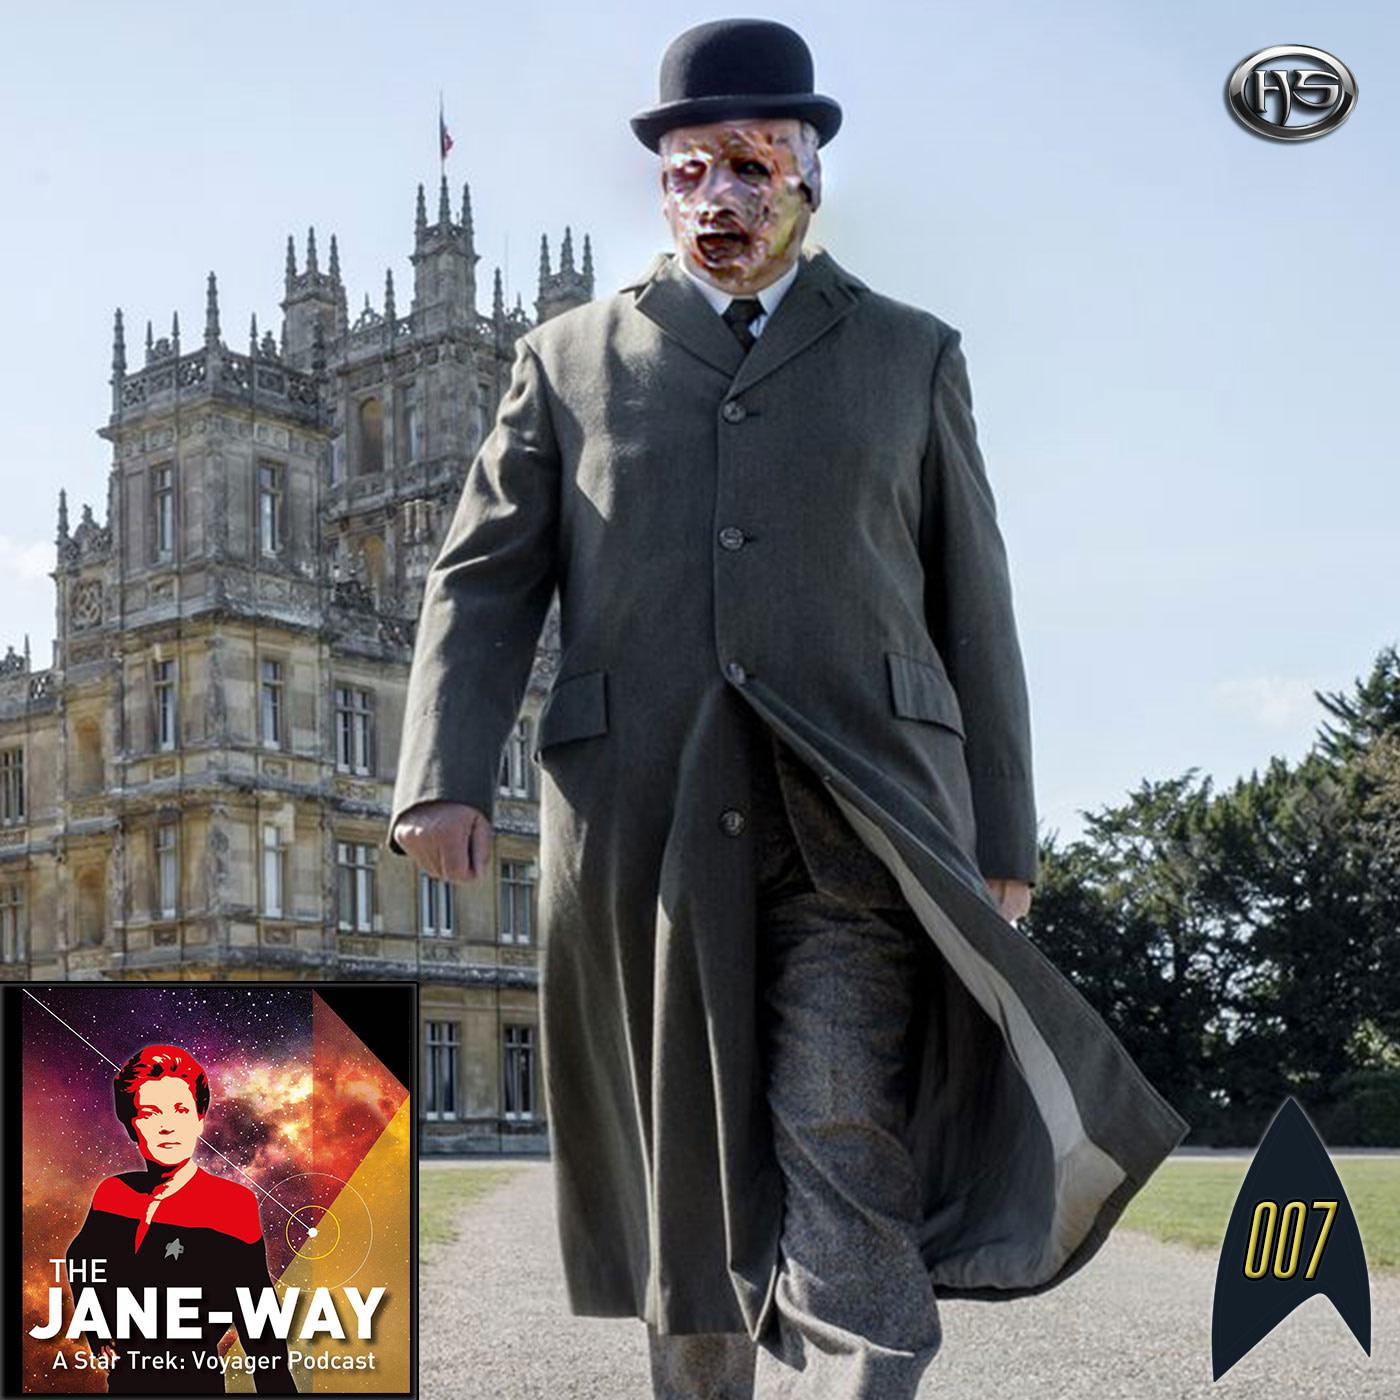 The Jane-Way Episode 7